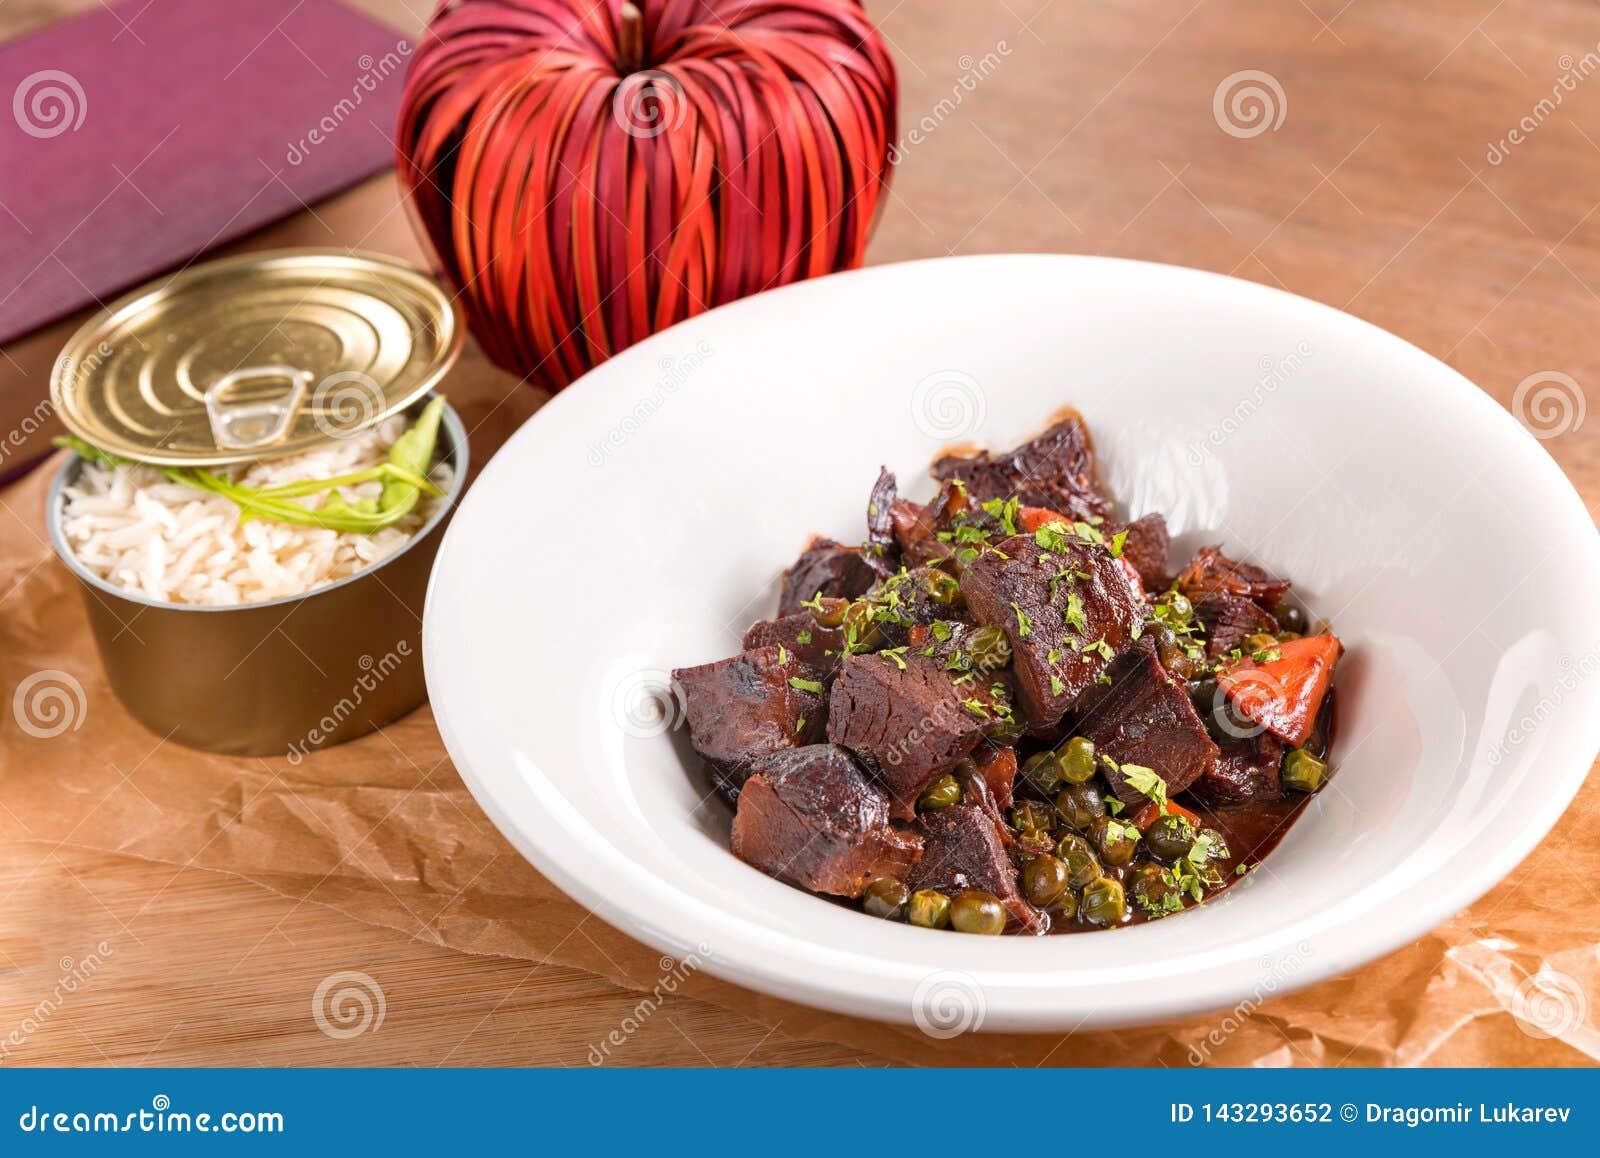 Stewed beef cheeks in red wine sauce